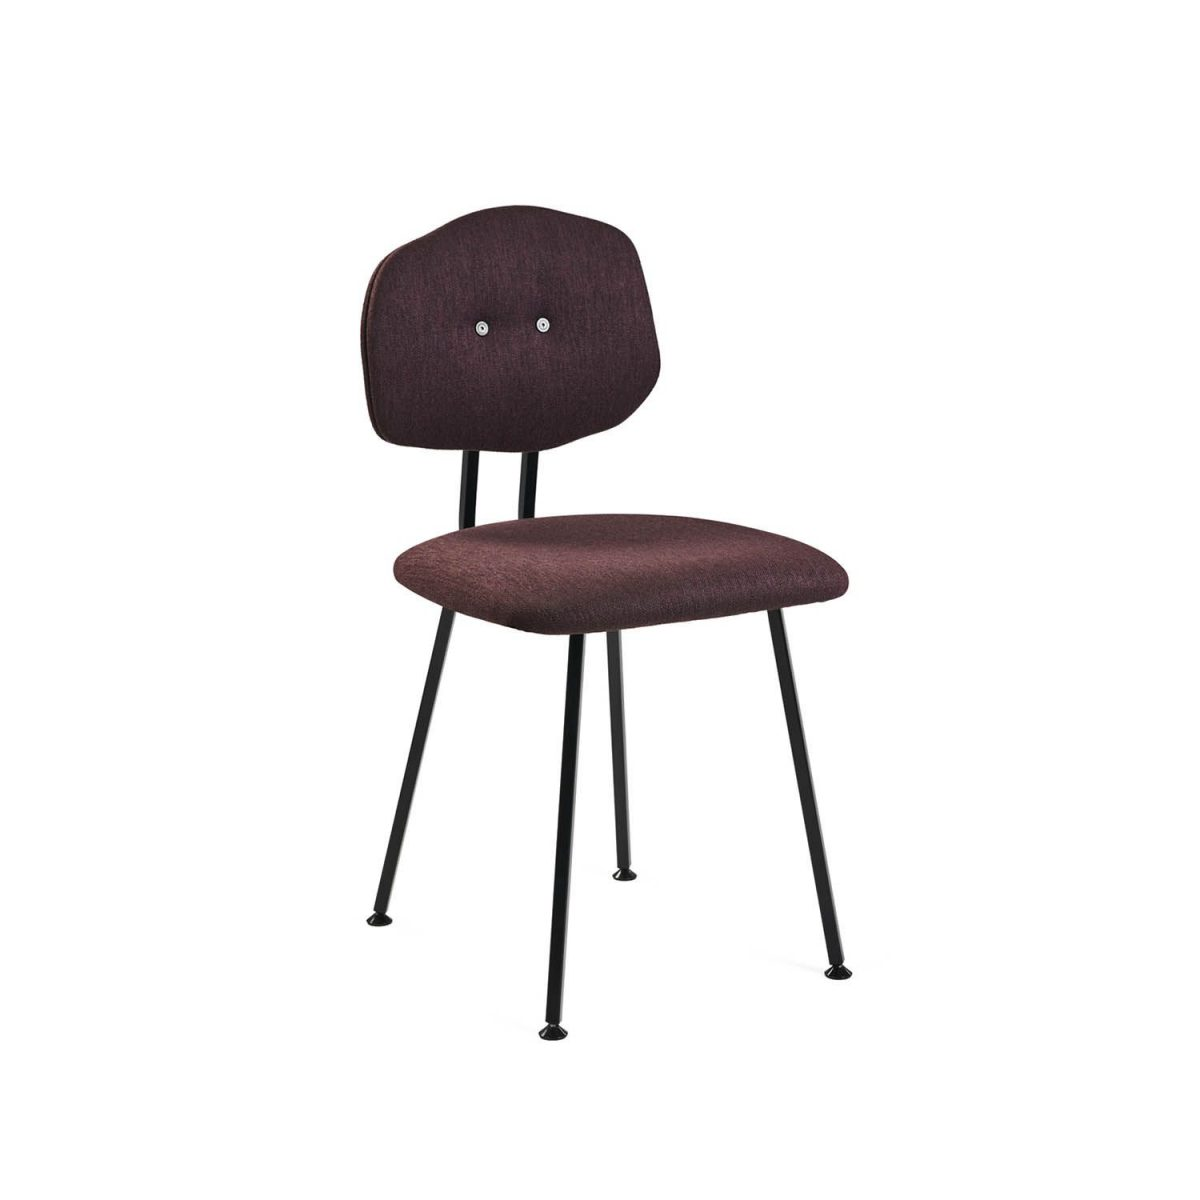 Aubergine Paars Maarten Baas 101 Stoel Projectstoel